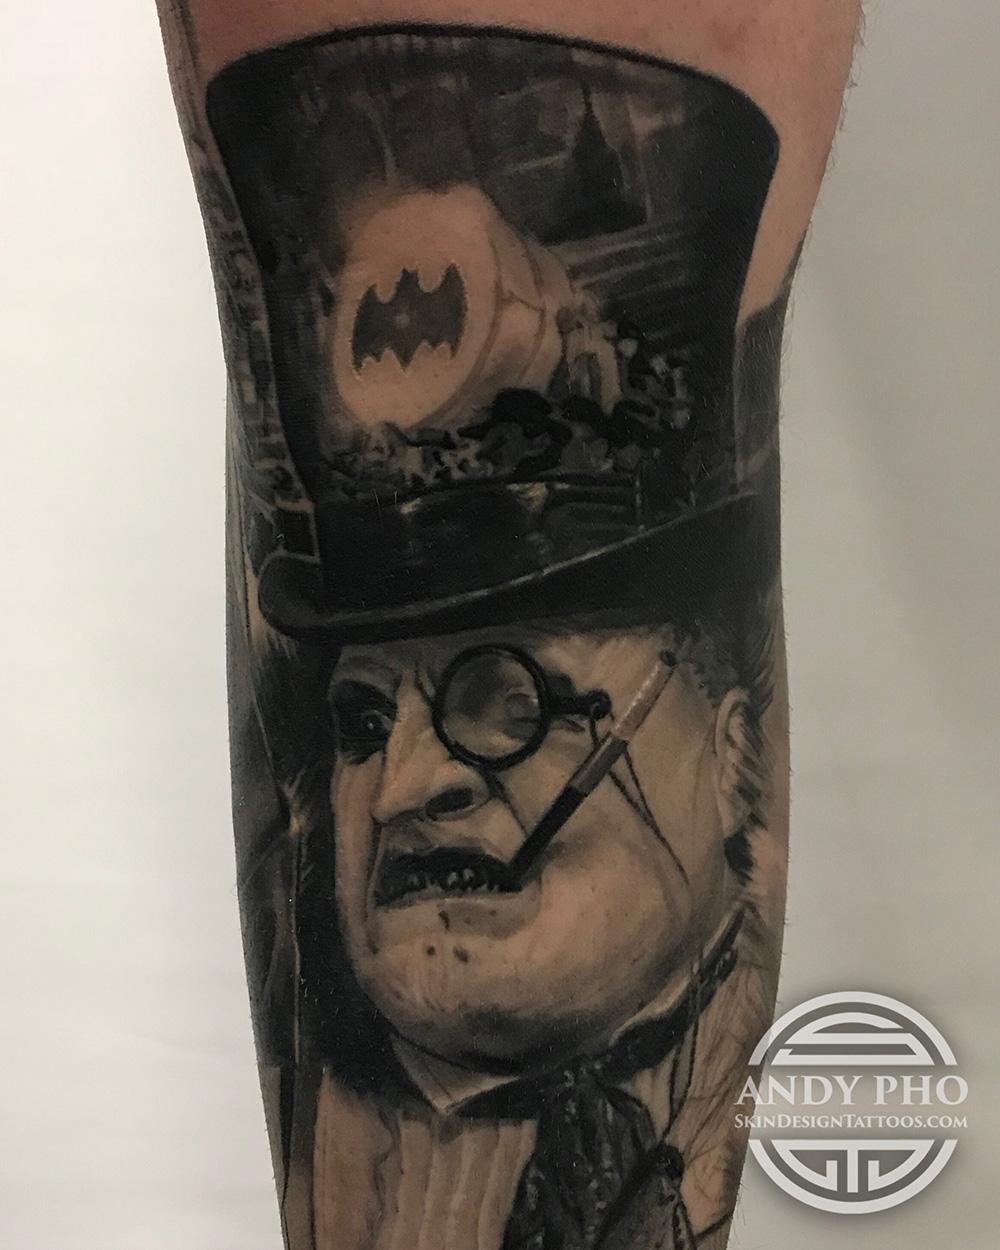 Andy Pho Penguin tattoo.JPG